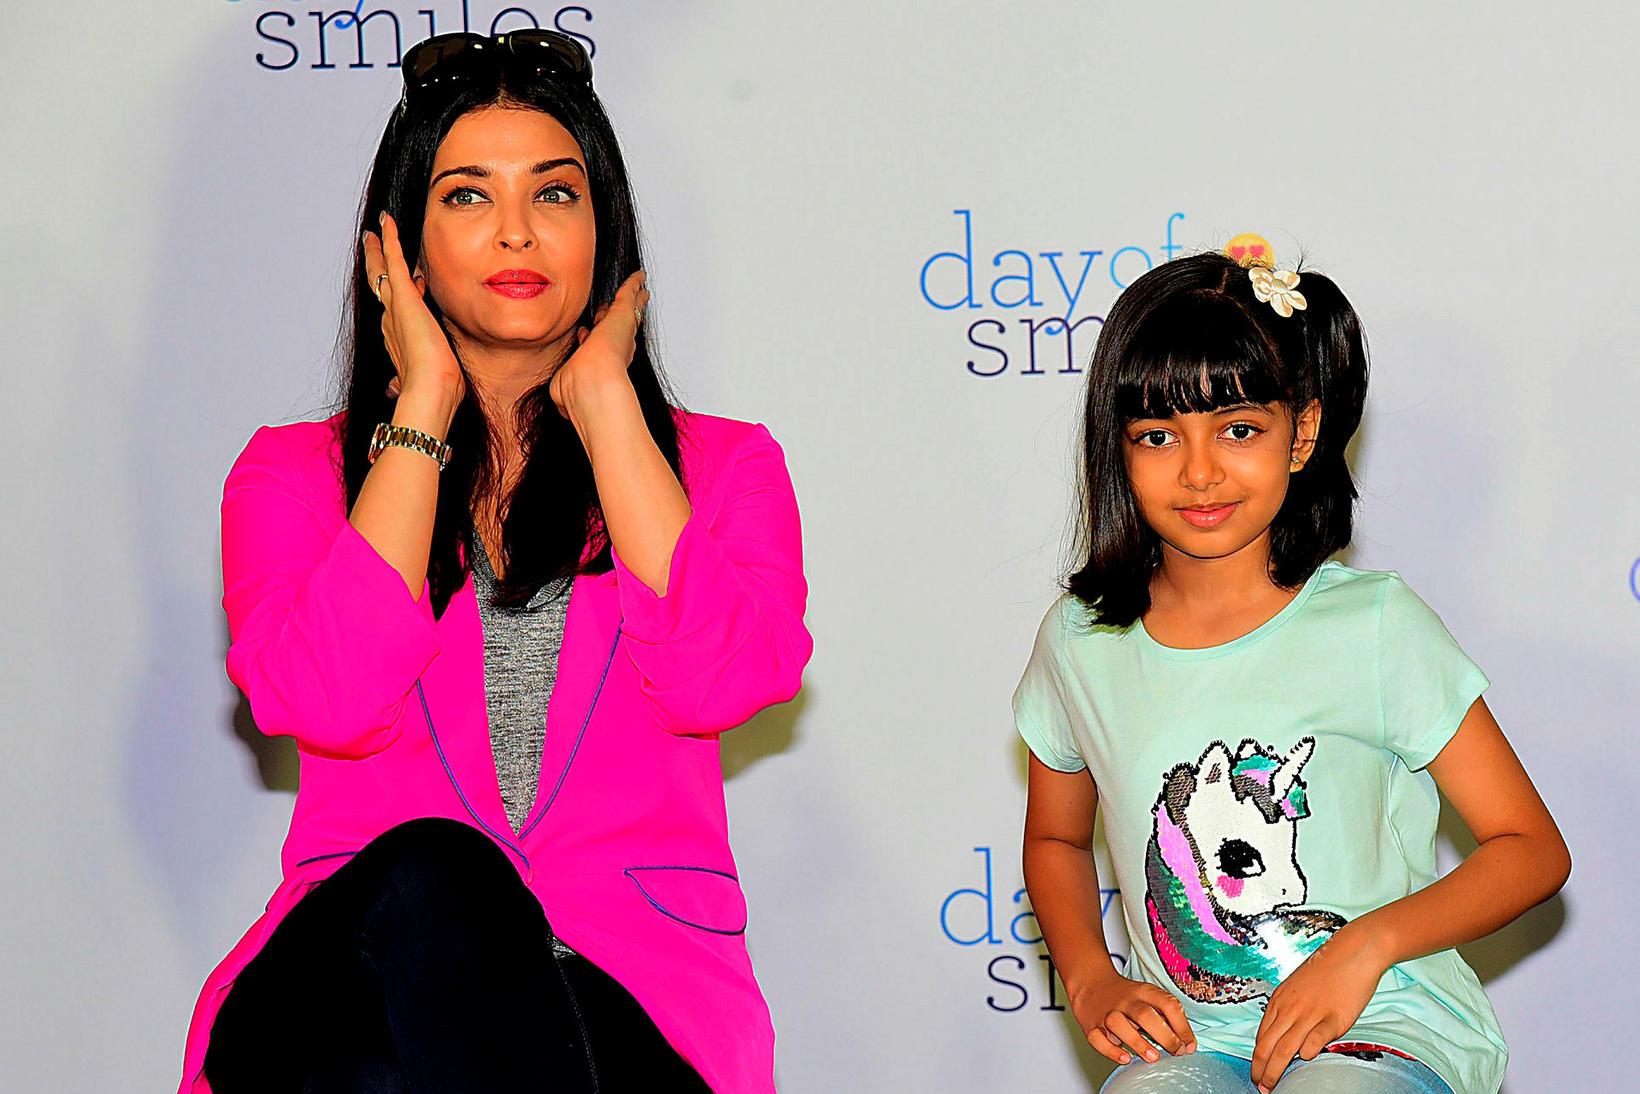 Aishwarya Rai Bachchan og dóttir hennar, Aaradhya Bachchan.